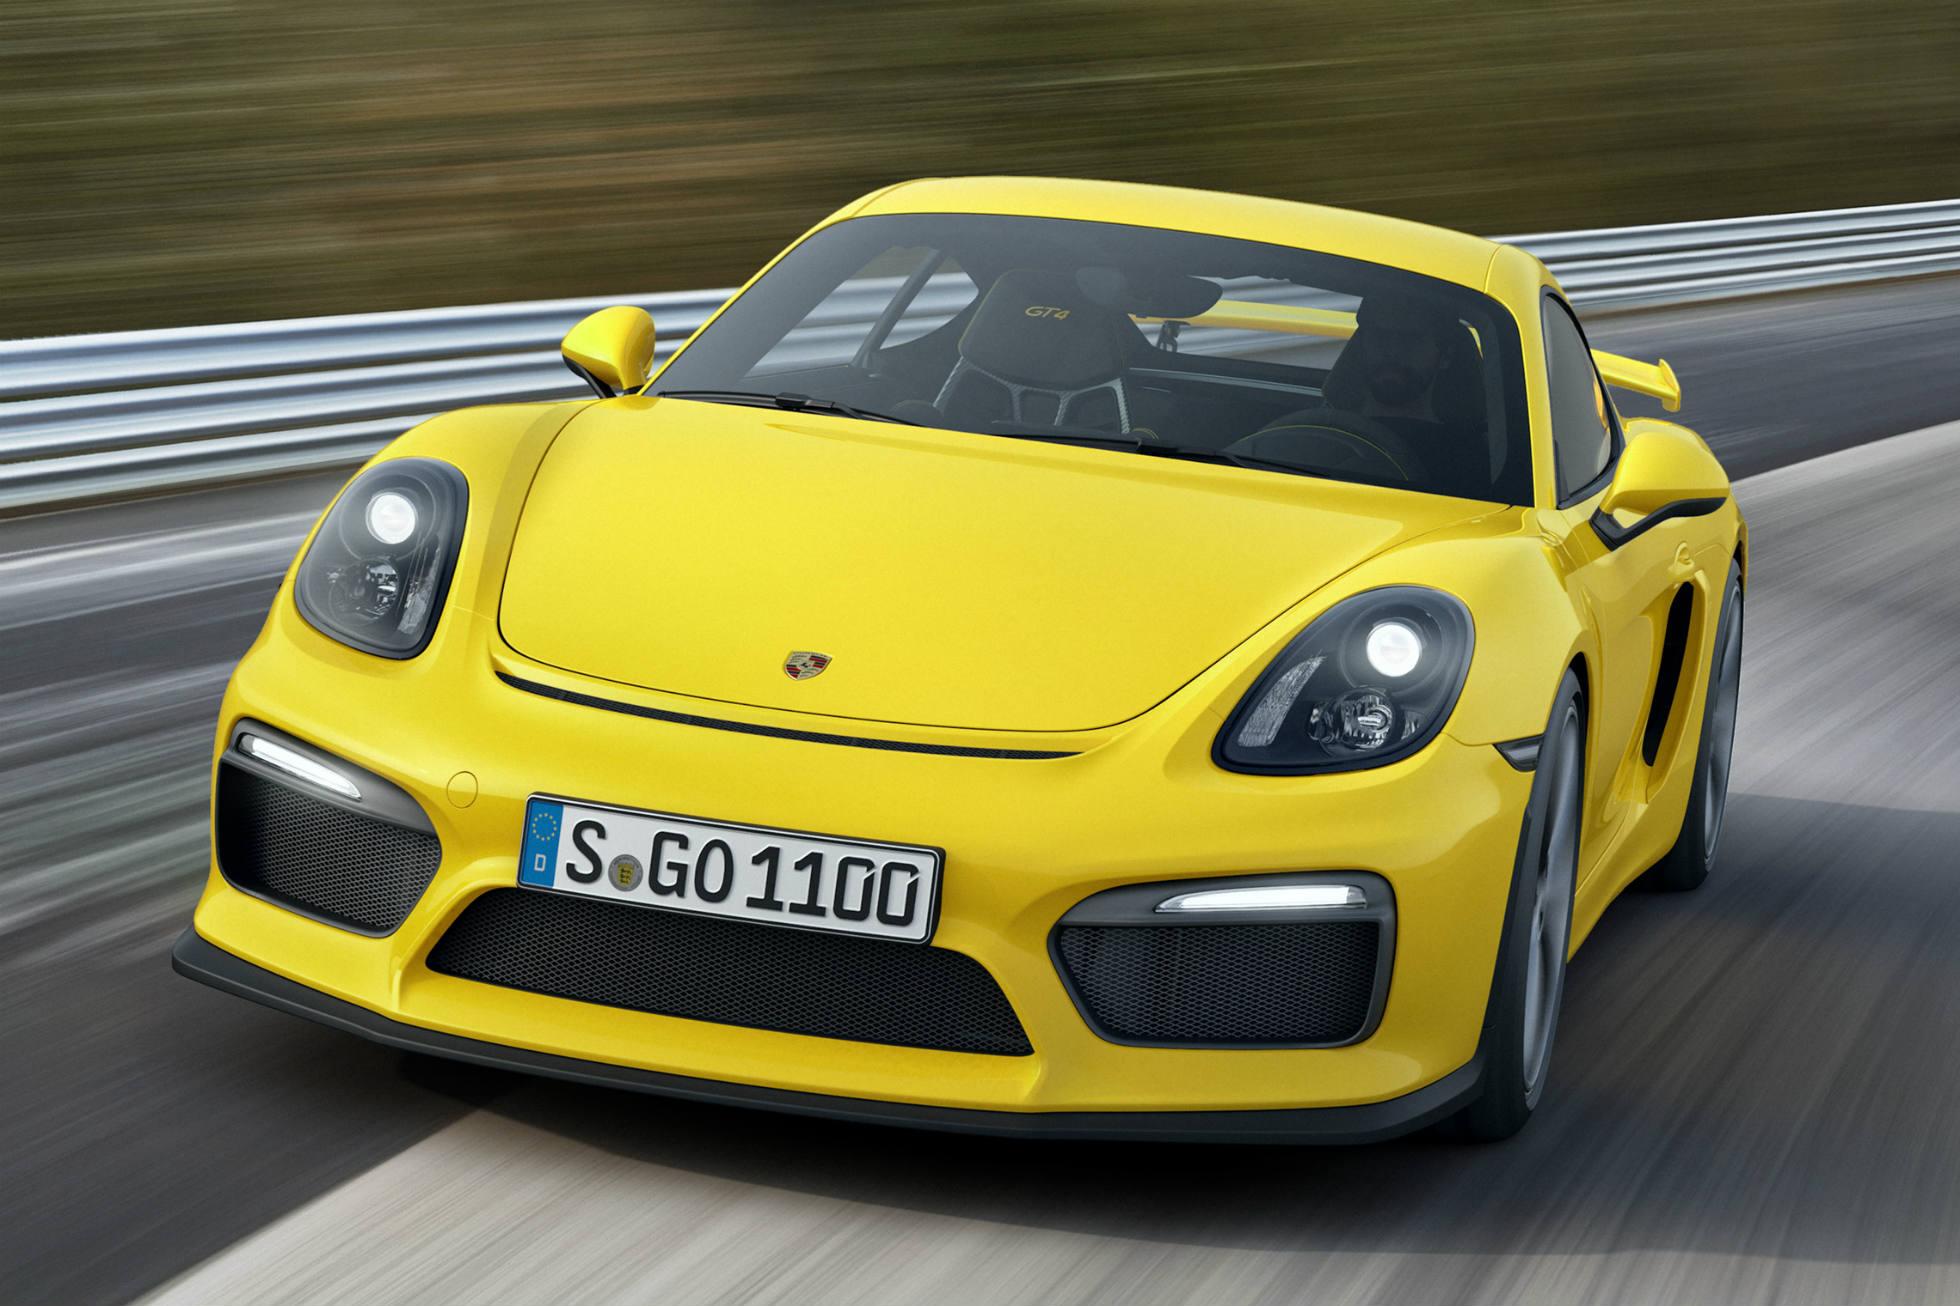 Porsche reveals Cayman GT4 ahead of Geneva Motor Show